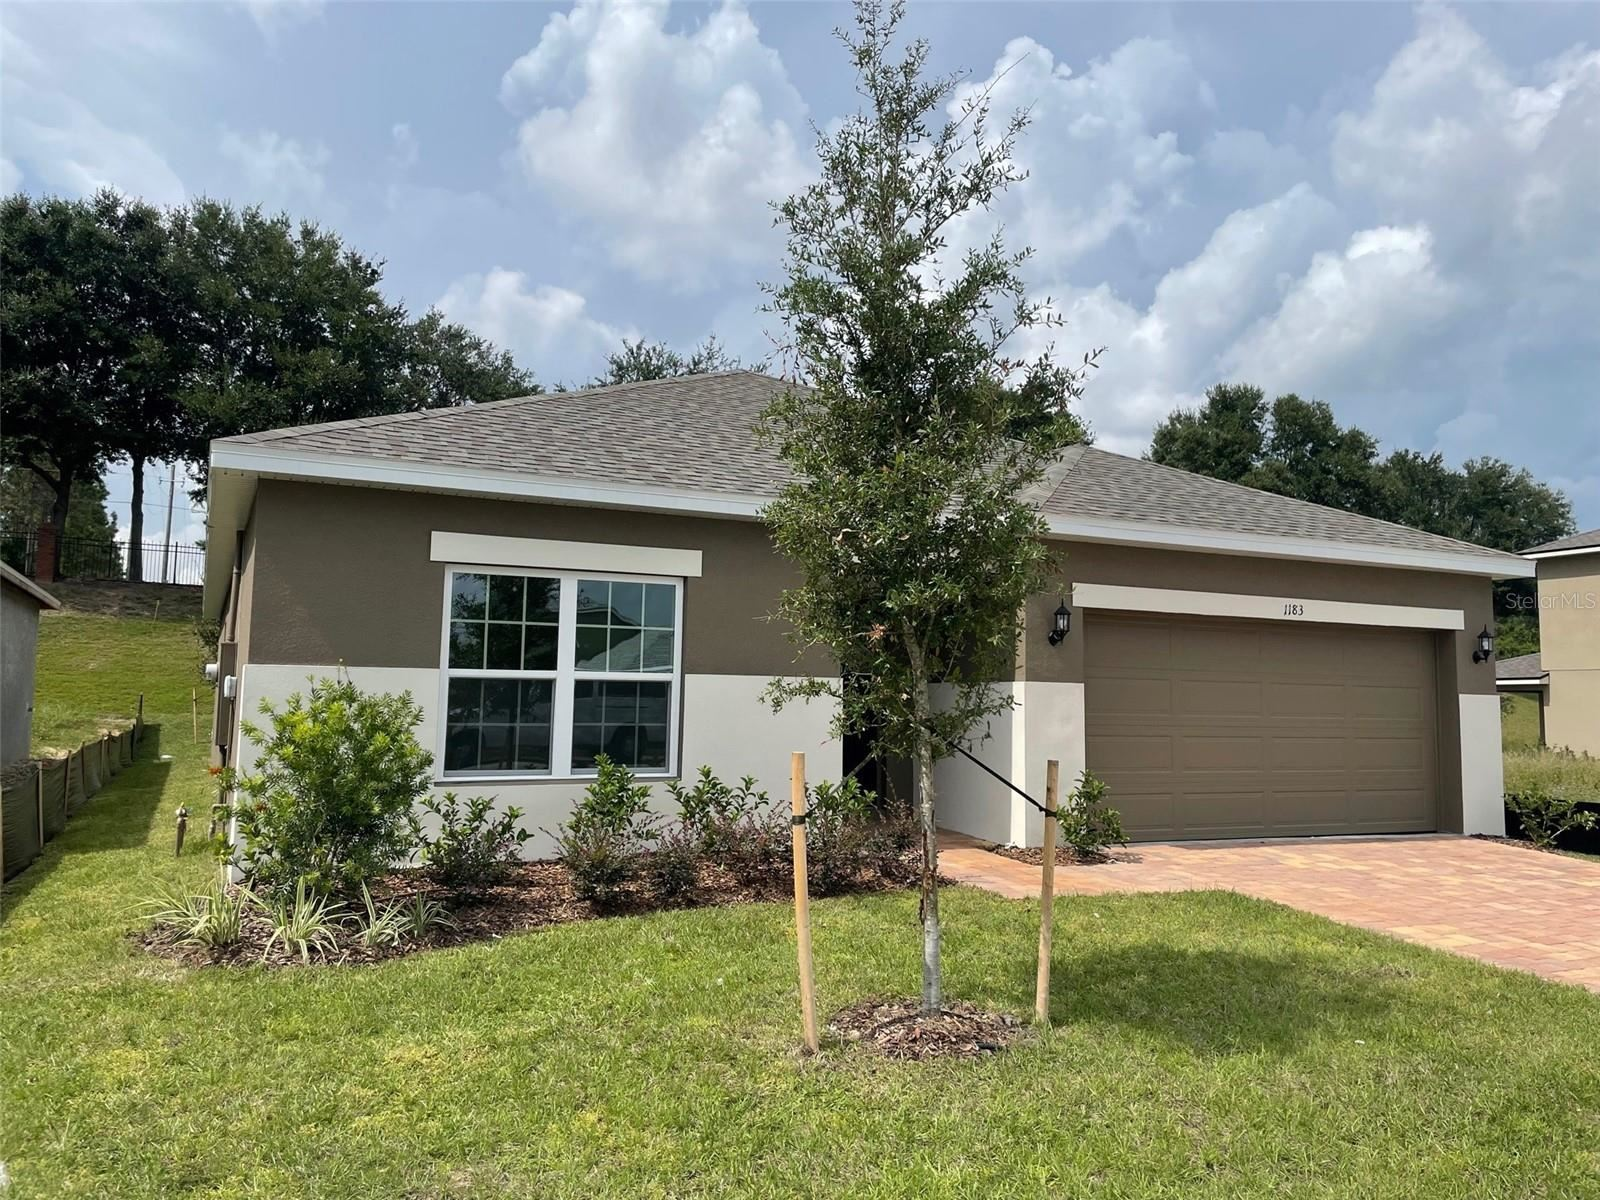 1183 STRATTON AVENUE, Groveland, FL 34736 - #: O5961781